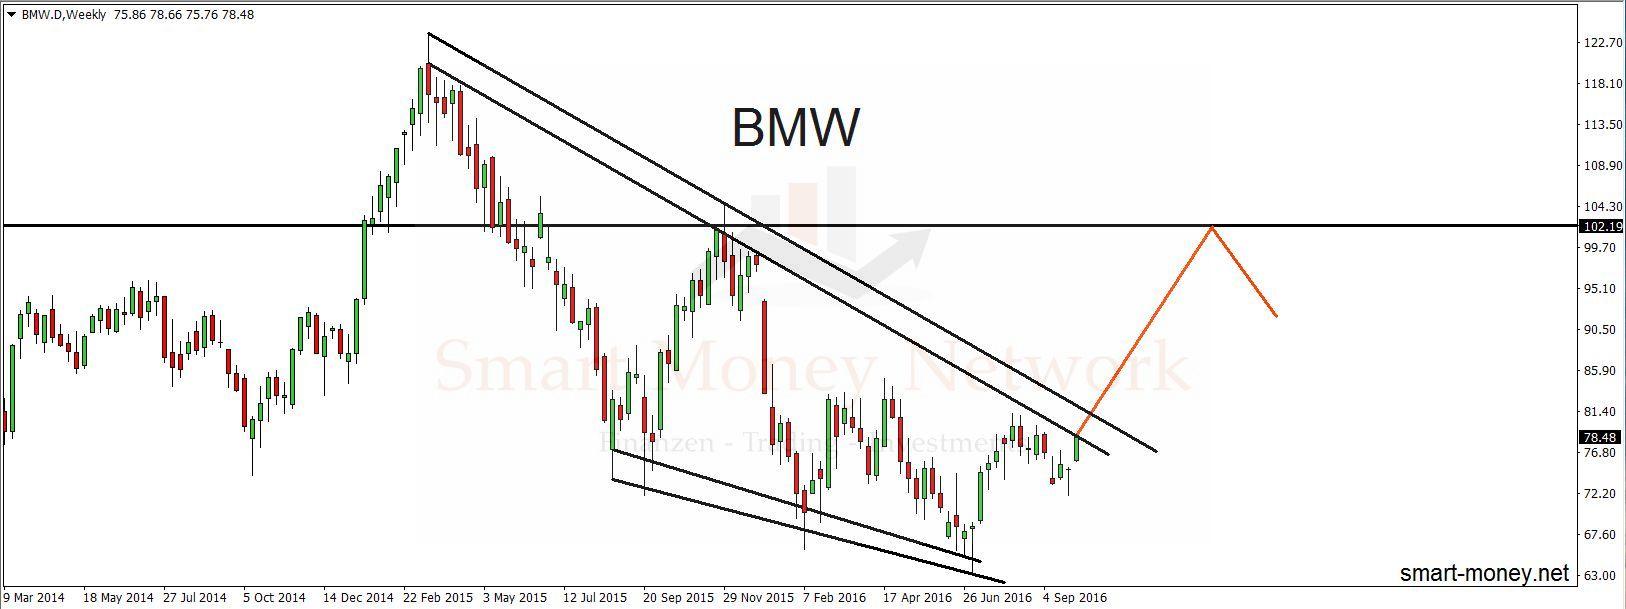 bmw_06-10-16